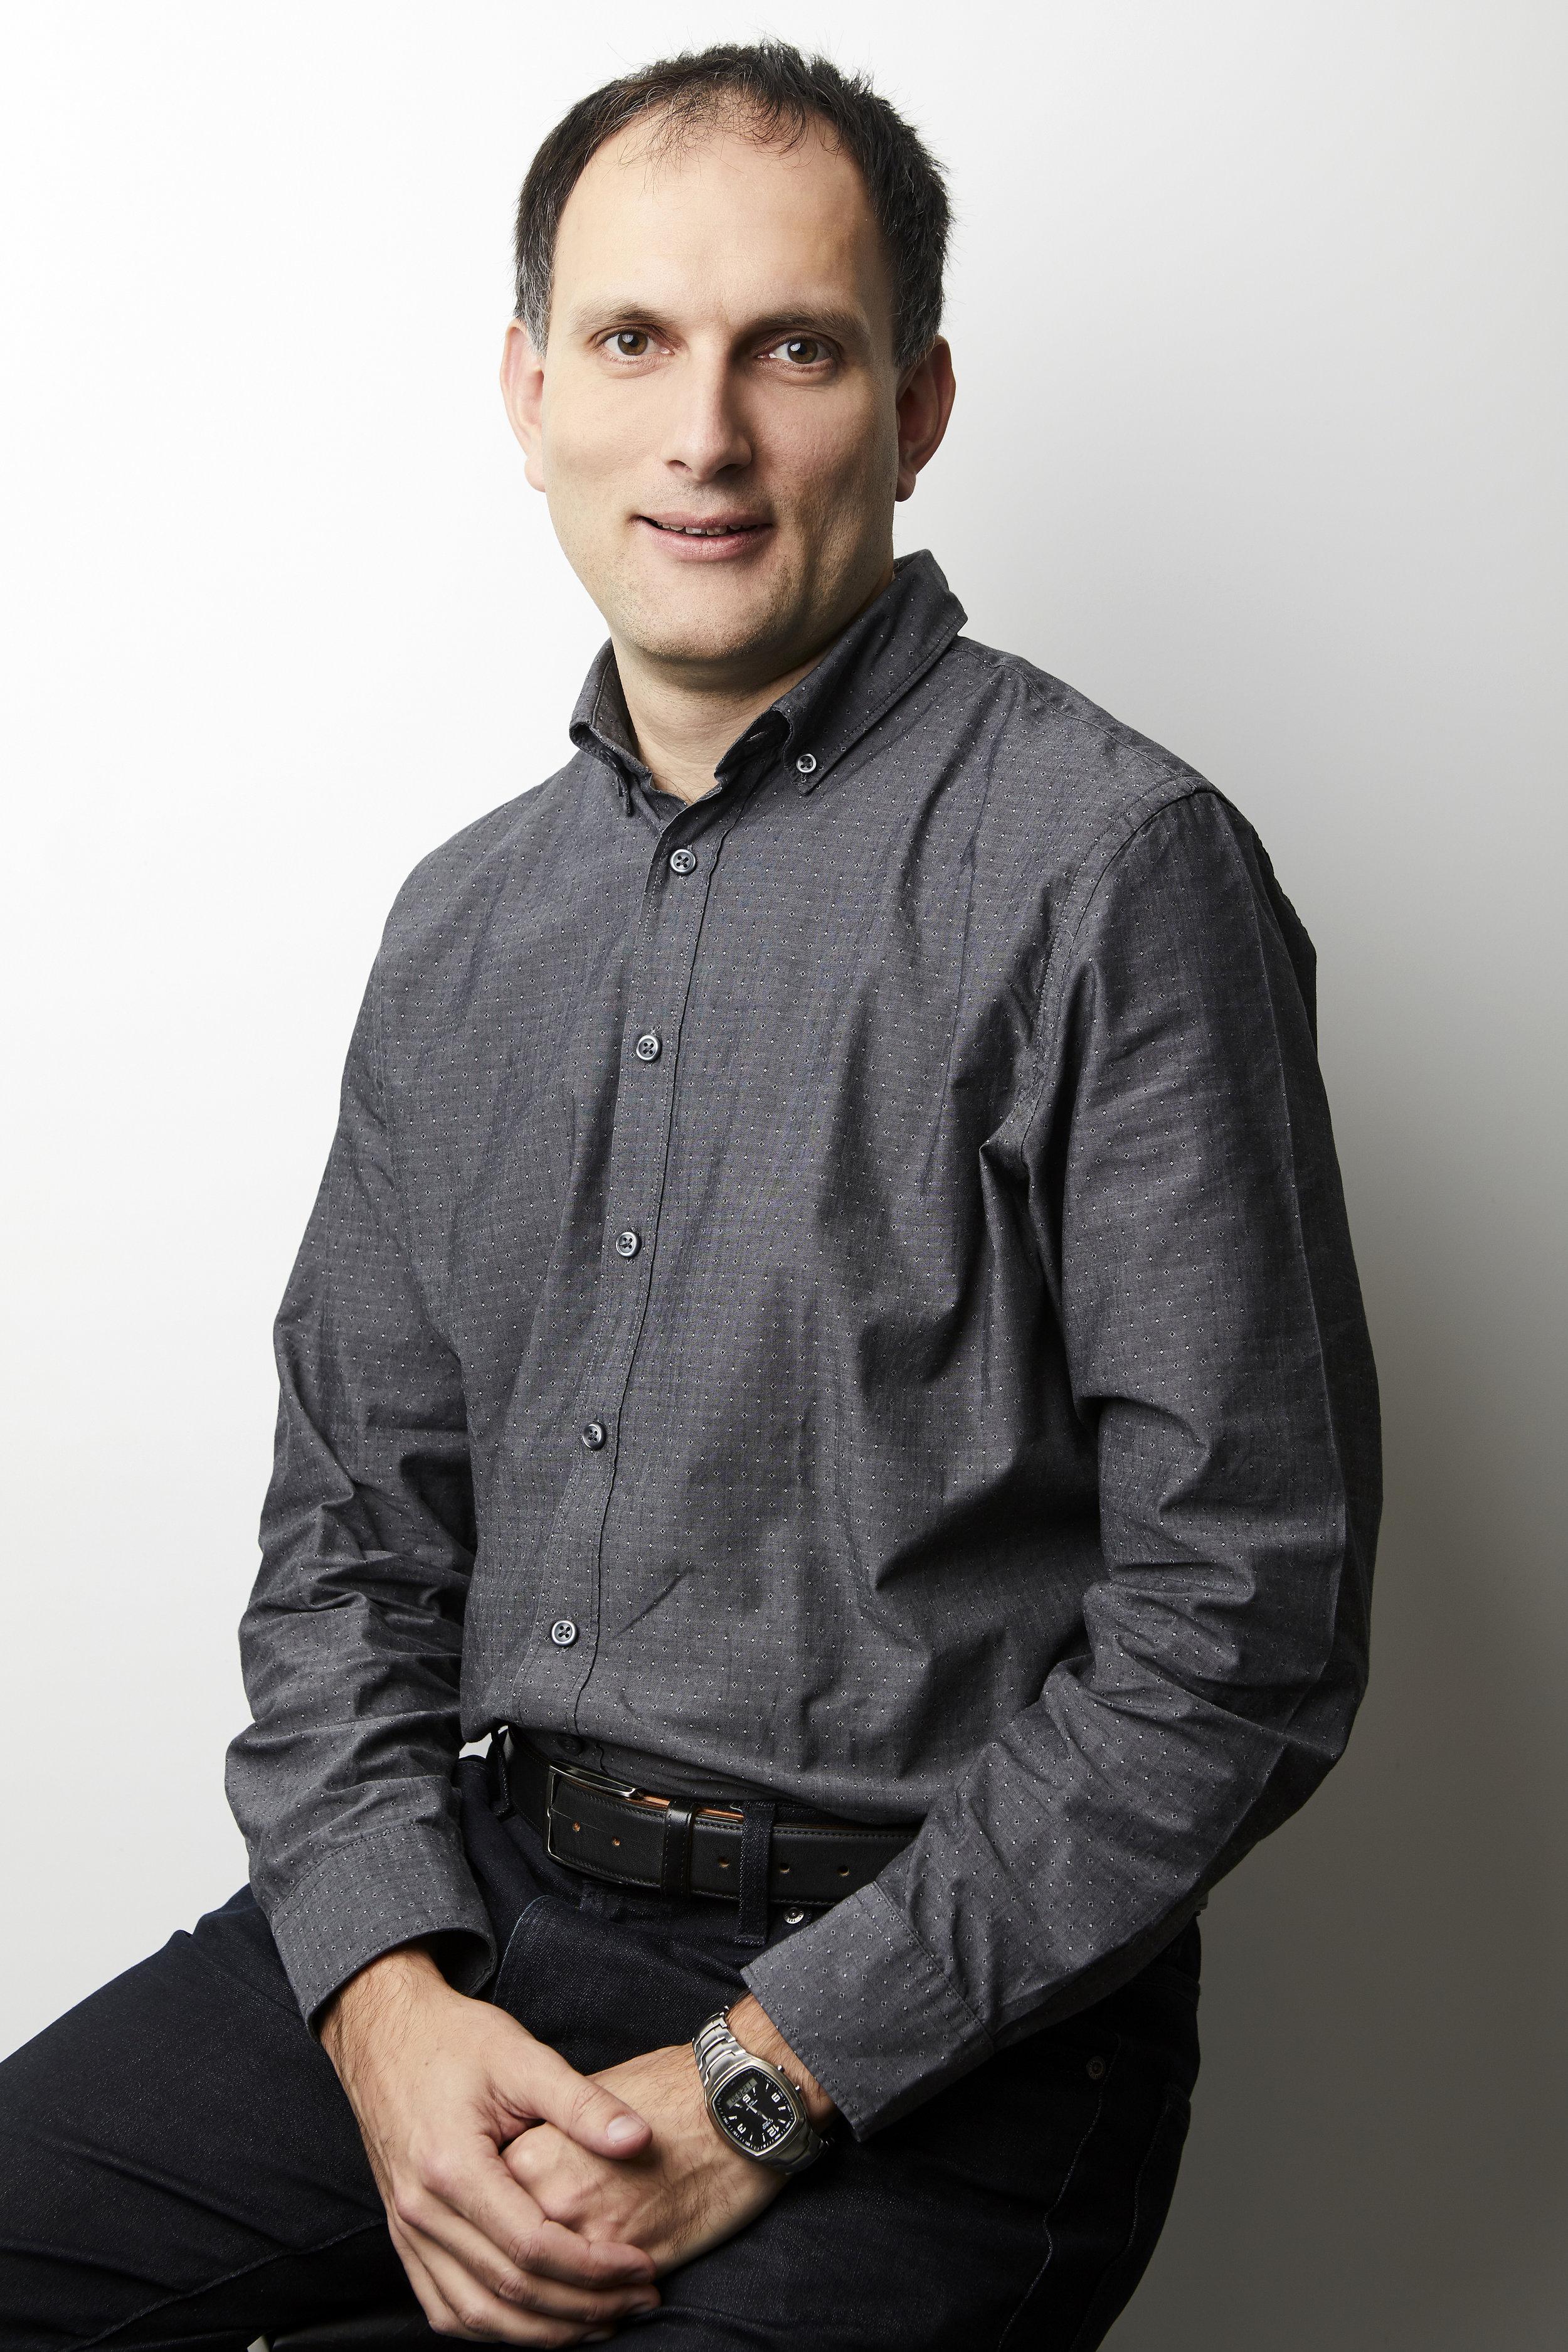 Petr Kasik